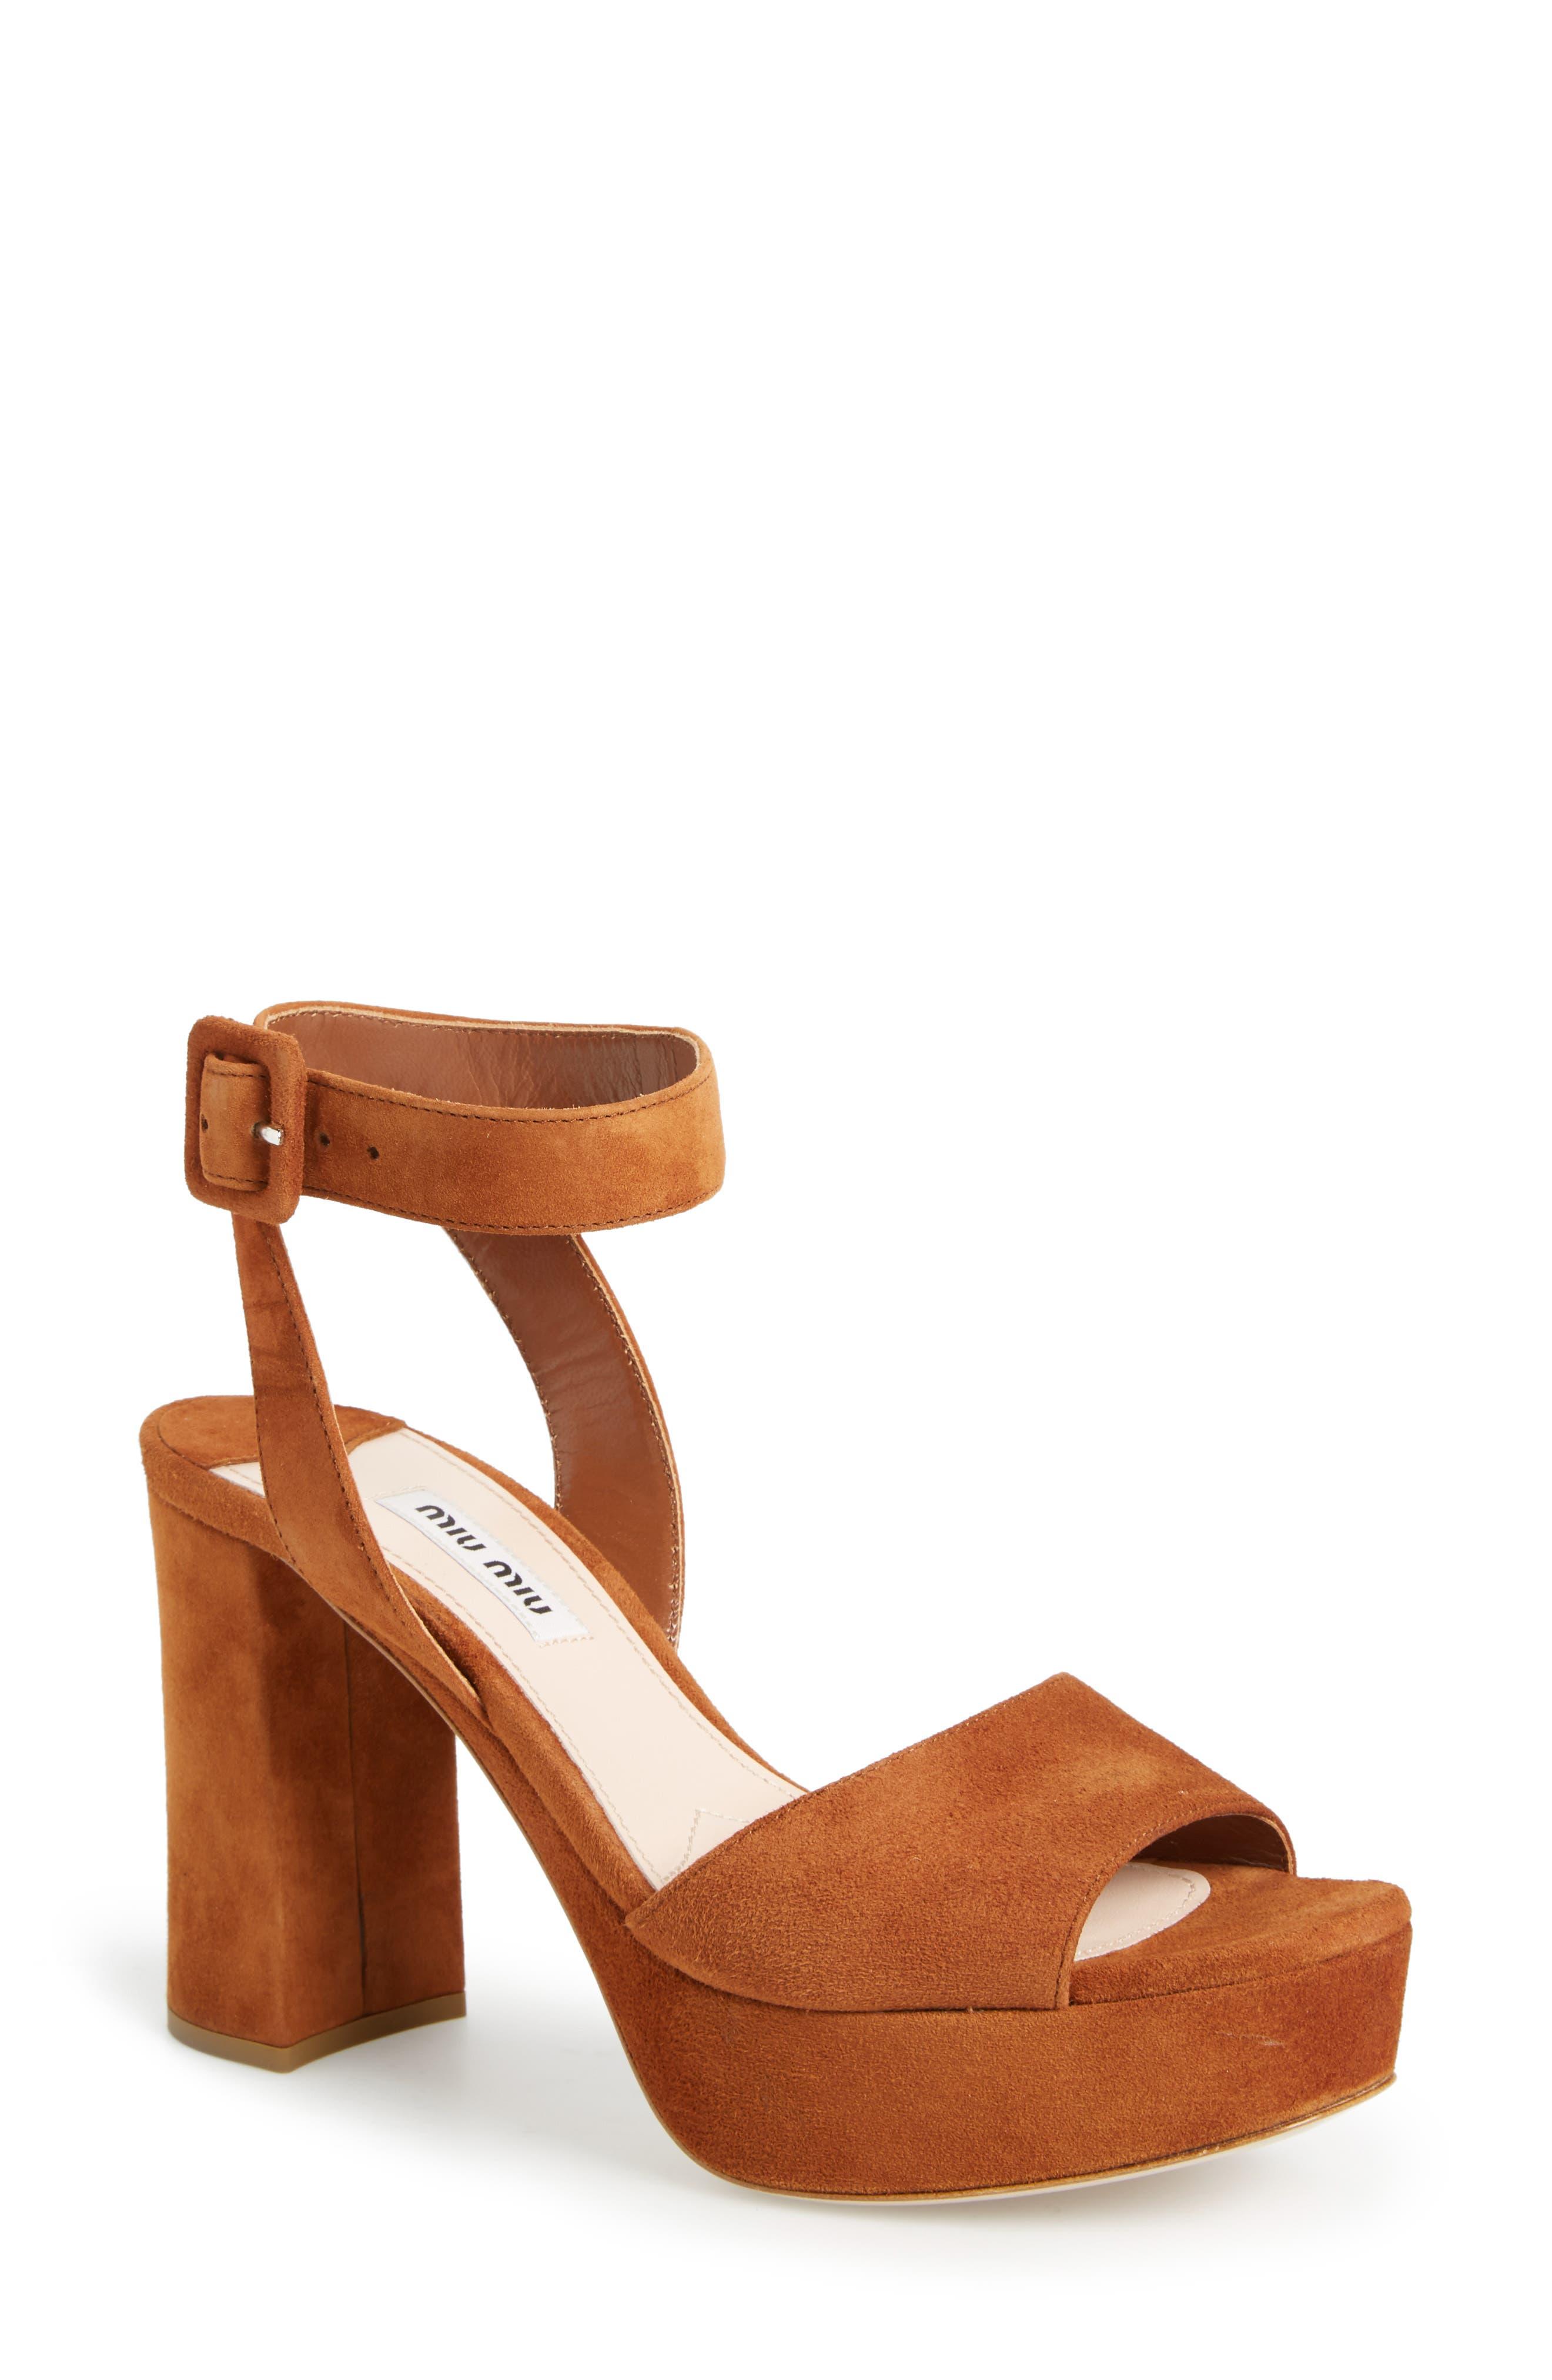 MIU MIU, 'Sandali' Ankle Strap Sandal, Alternate thumbnail 4, color, 200